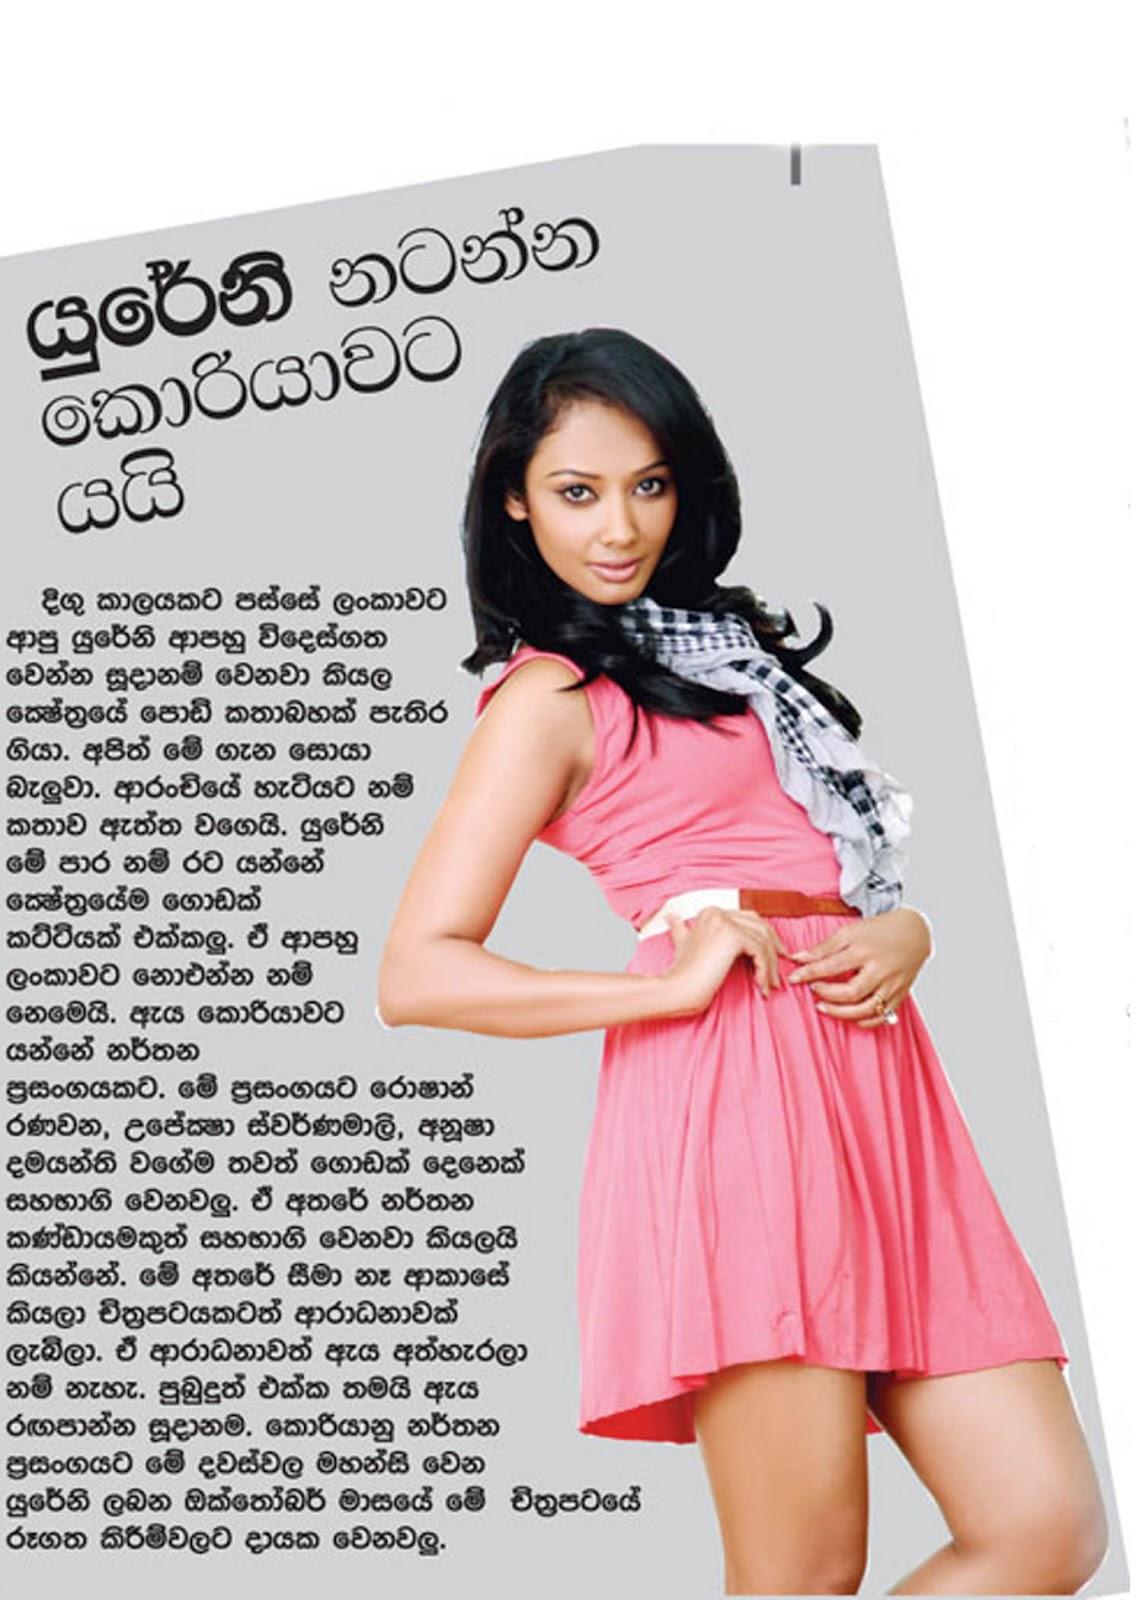 Gossip Lanka News Sinhala News Sinhala Today - Kharita Blog